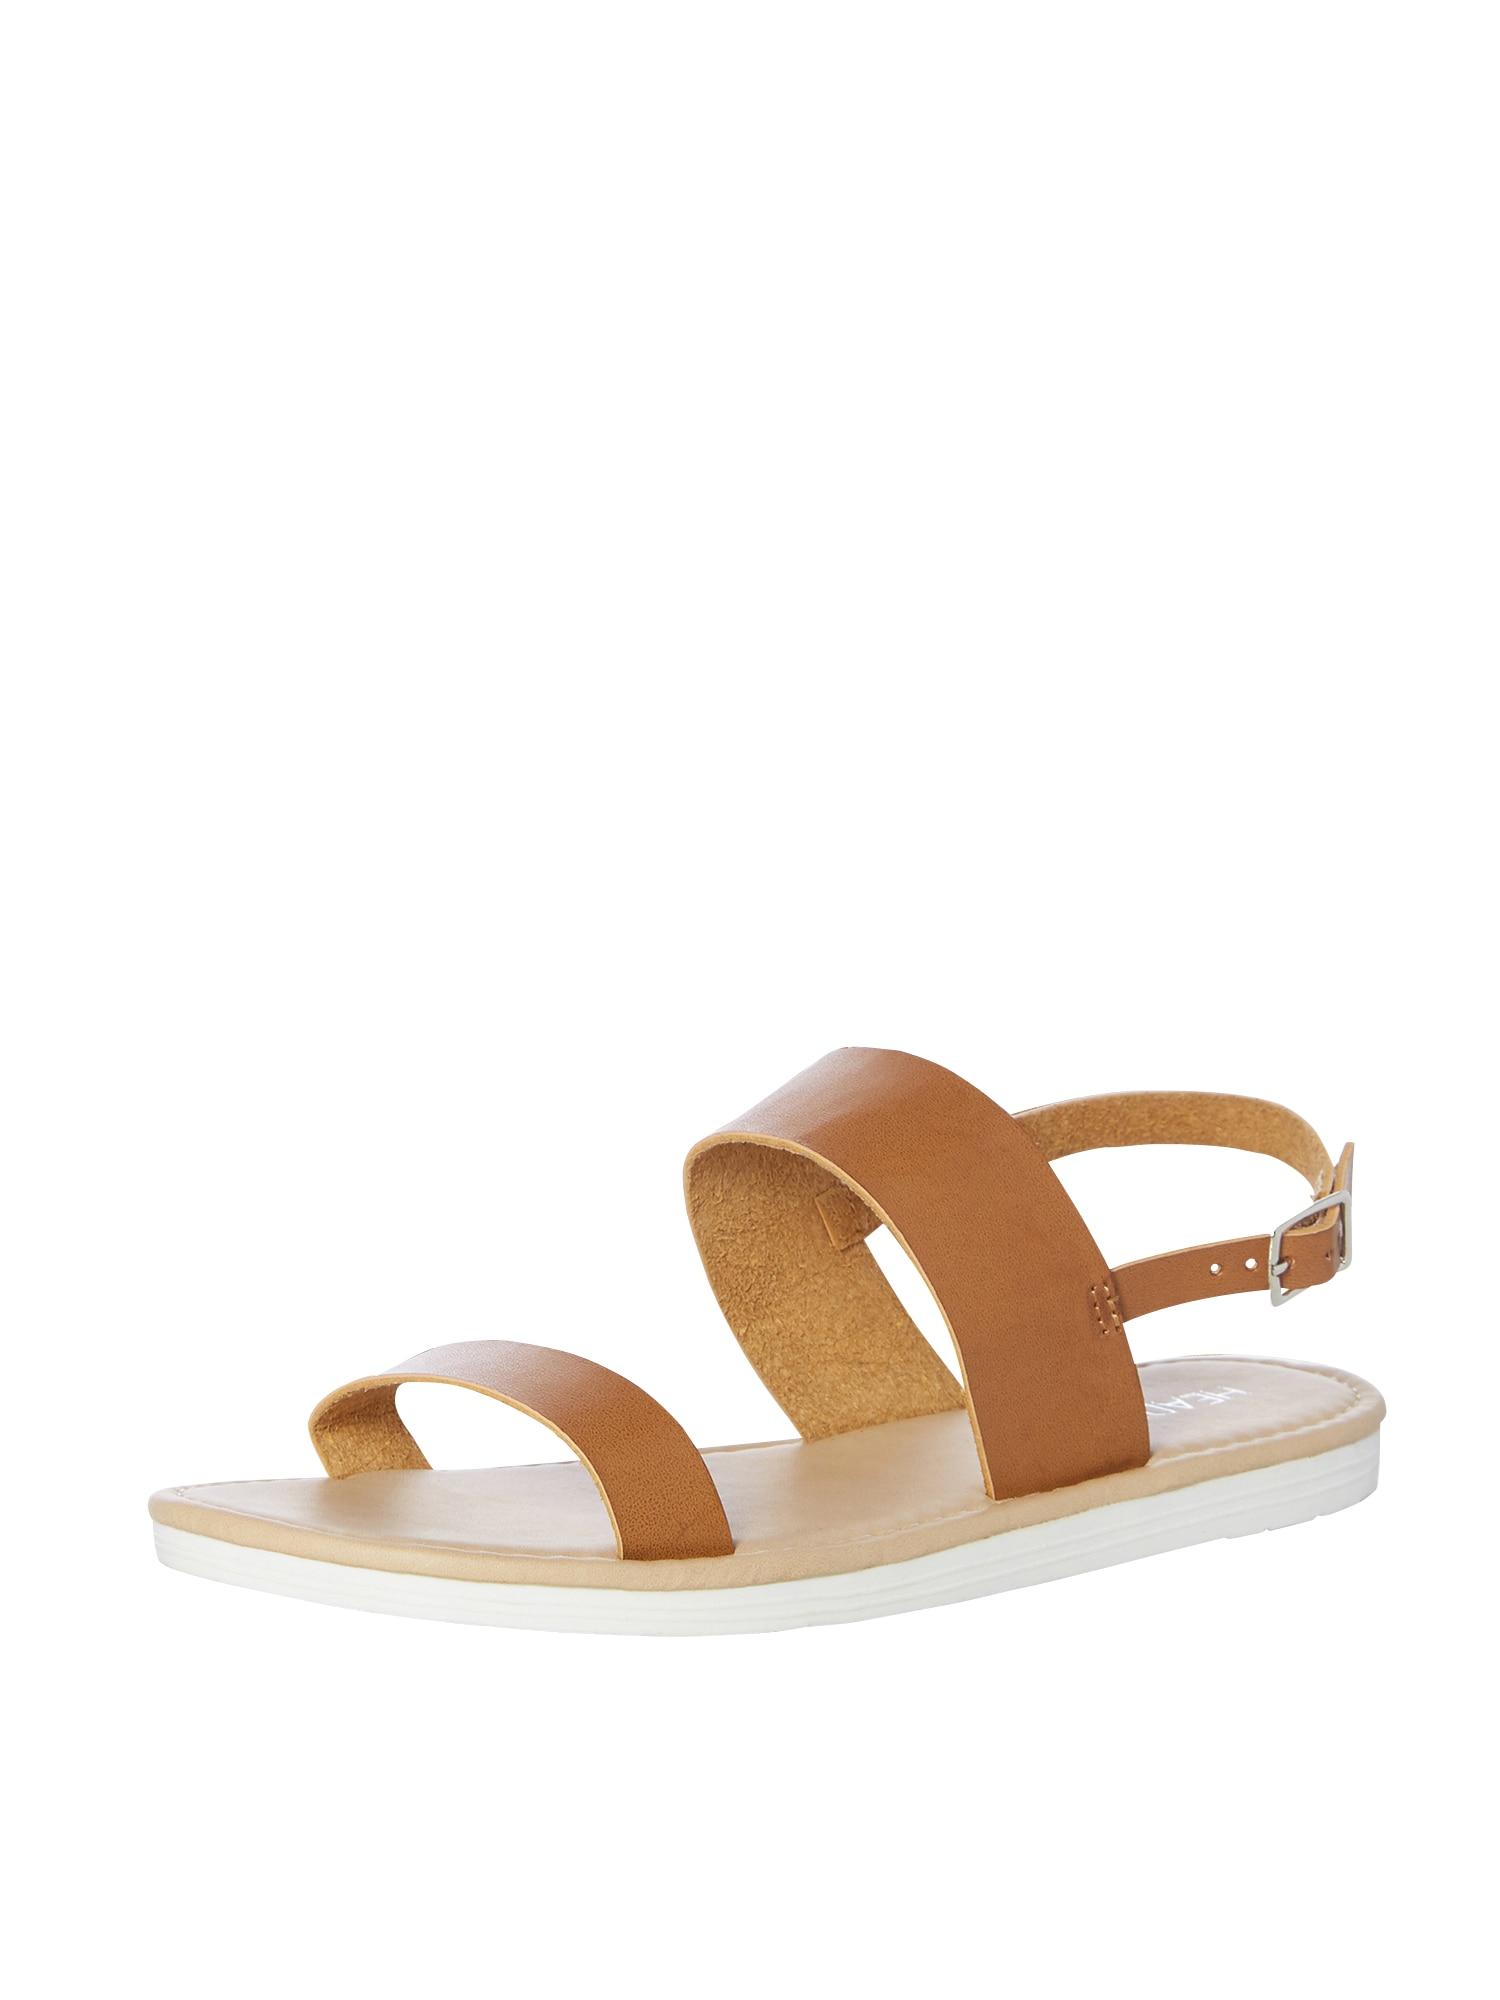 Páskové sandály Laila koňaková Head Over Heels